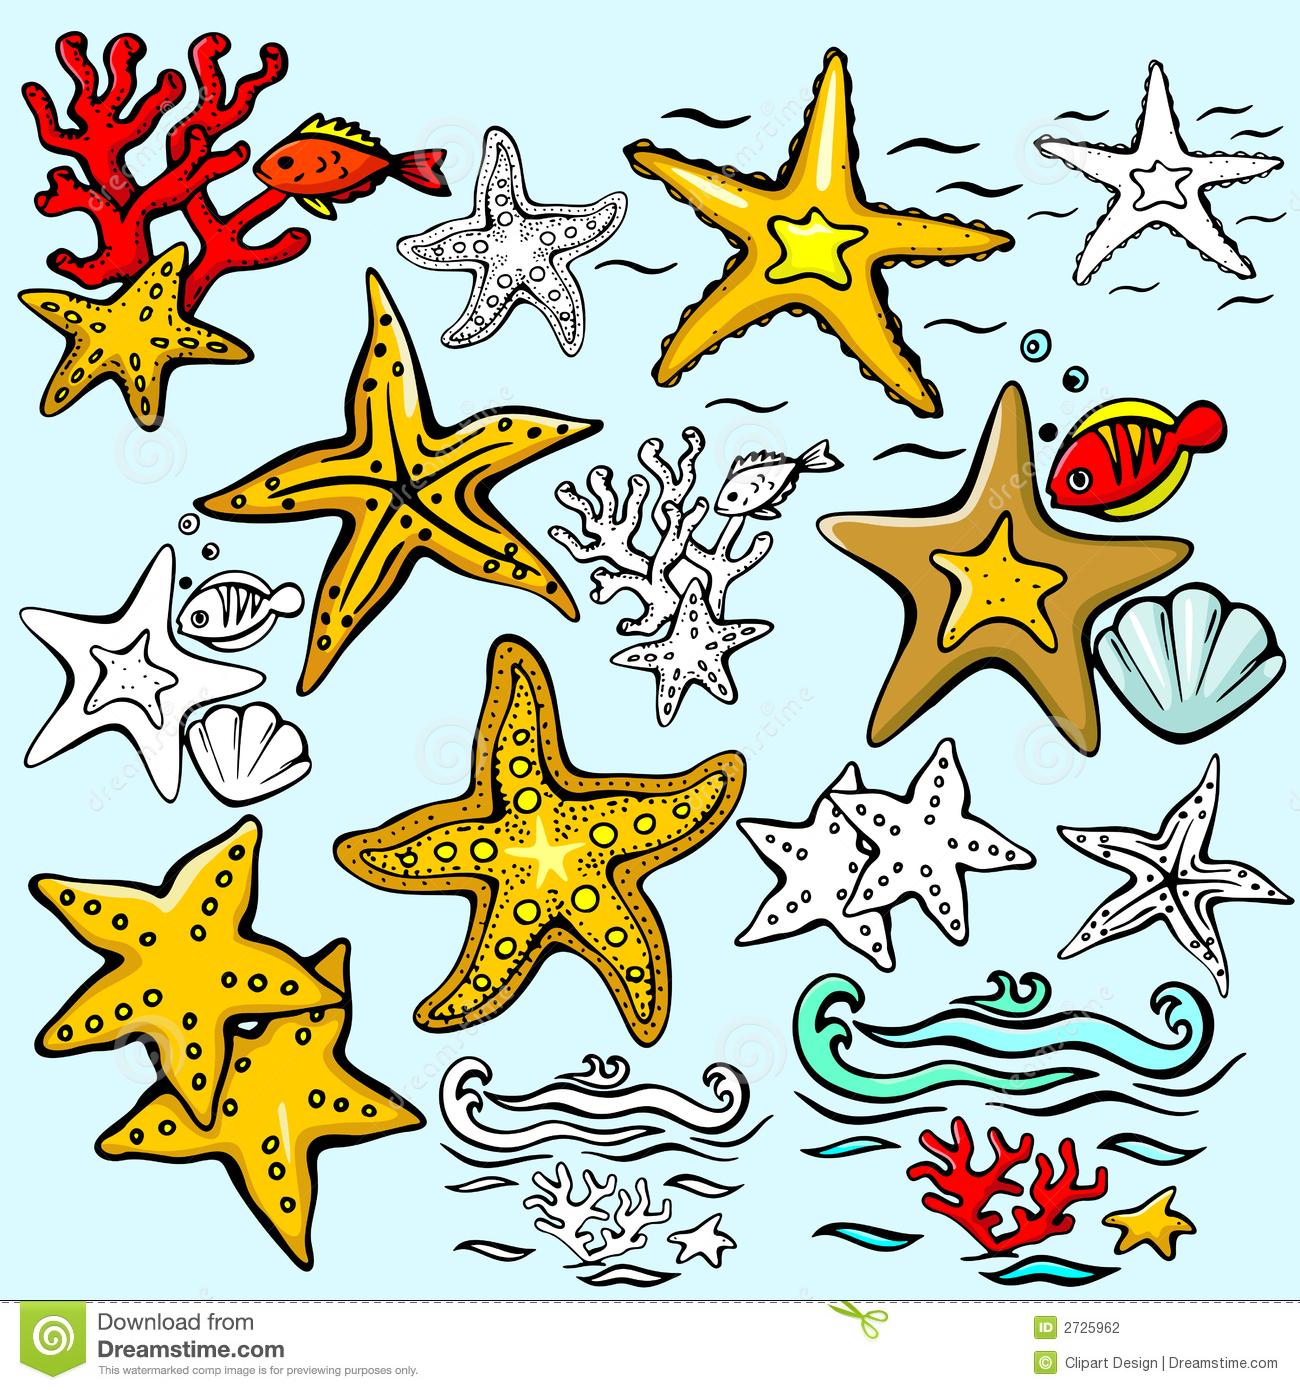 Seaworld Stock Illustrations.